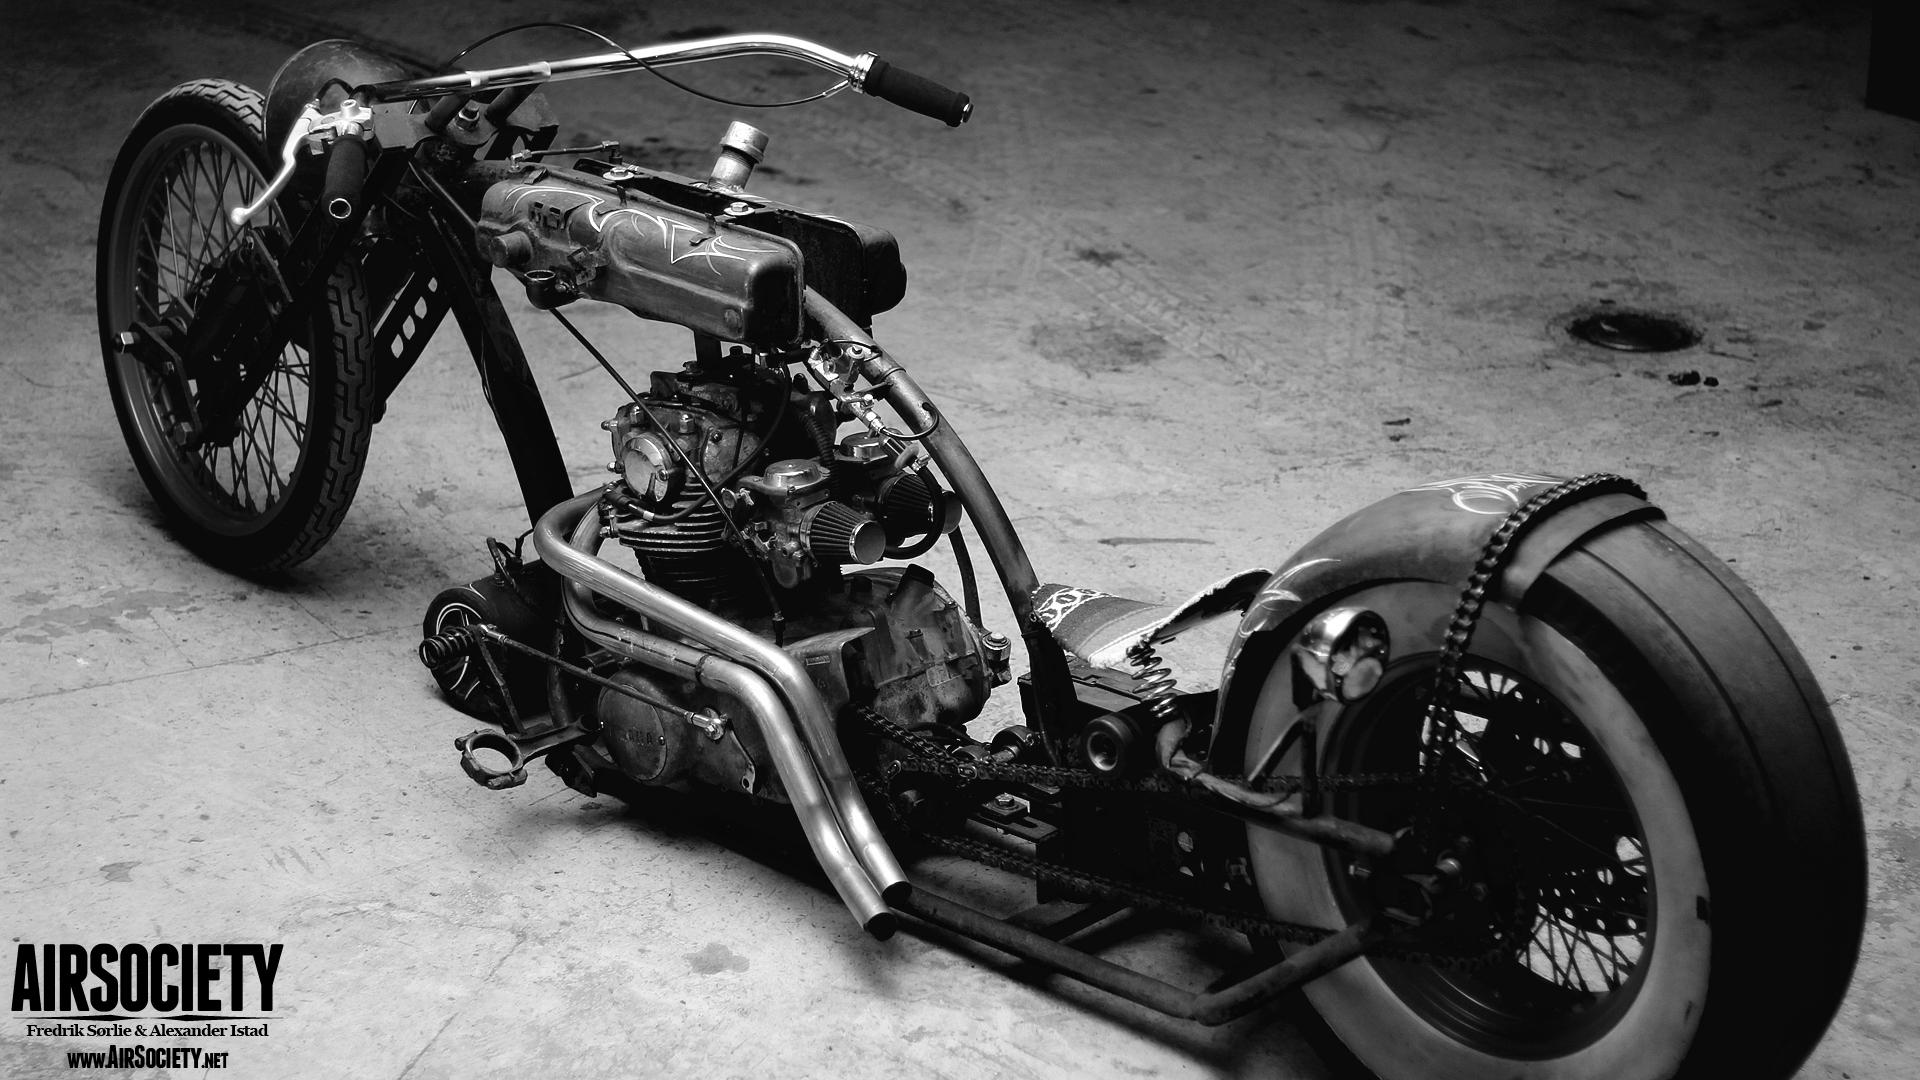 download Motorcycles Yamaha Xs650 Motorbike Chopper Bobber 1920x1080